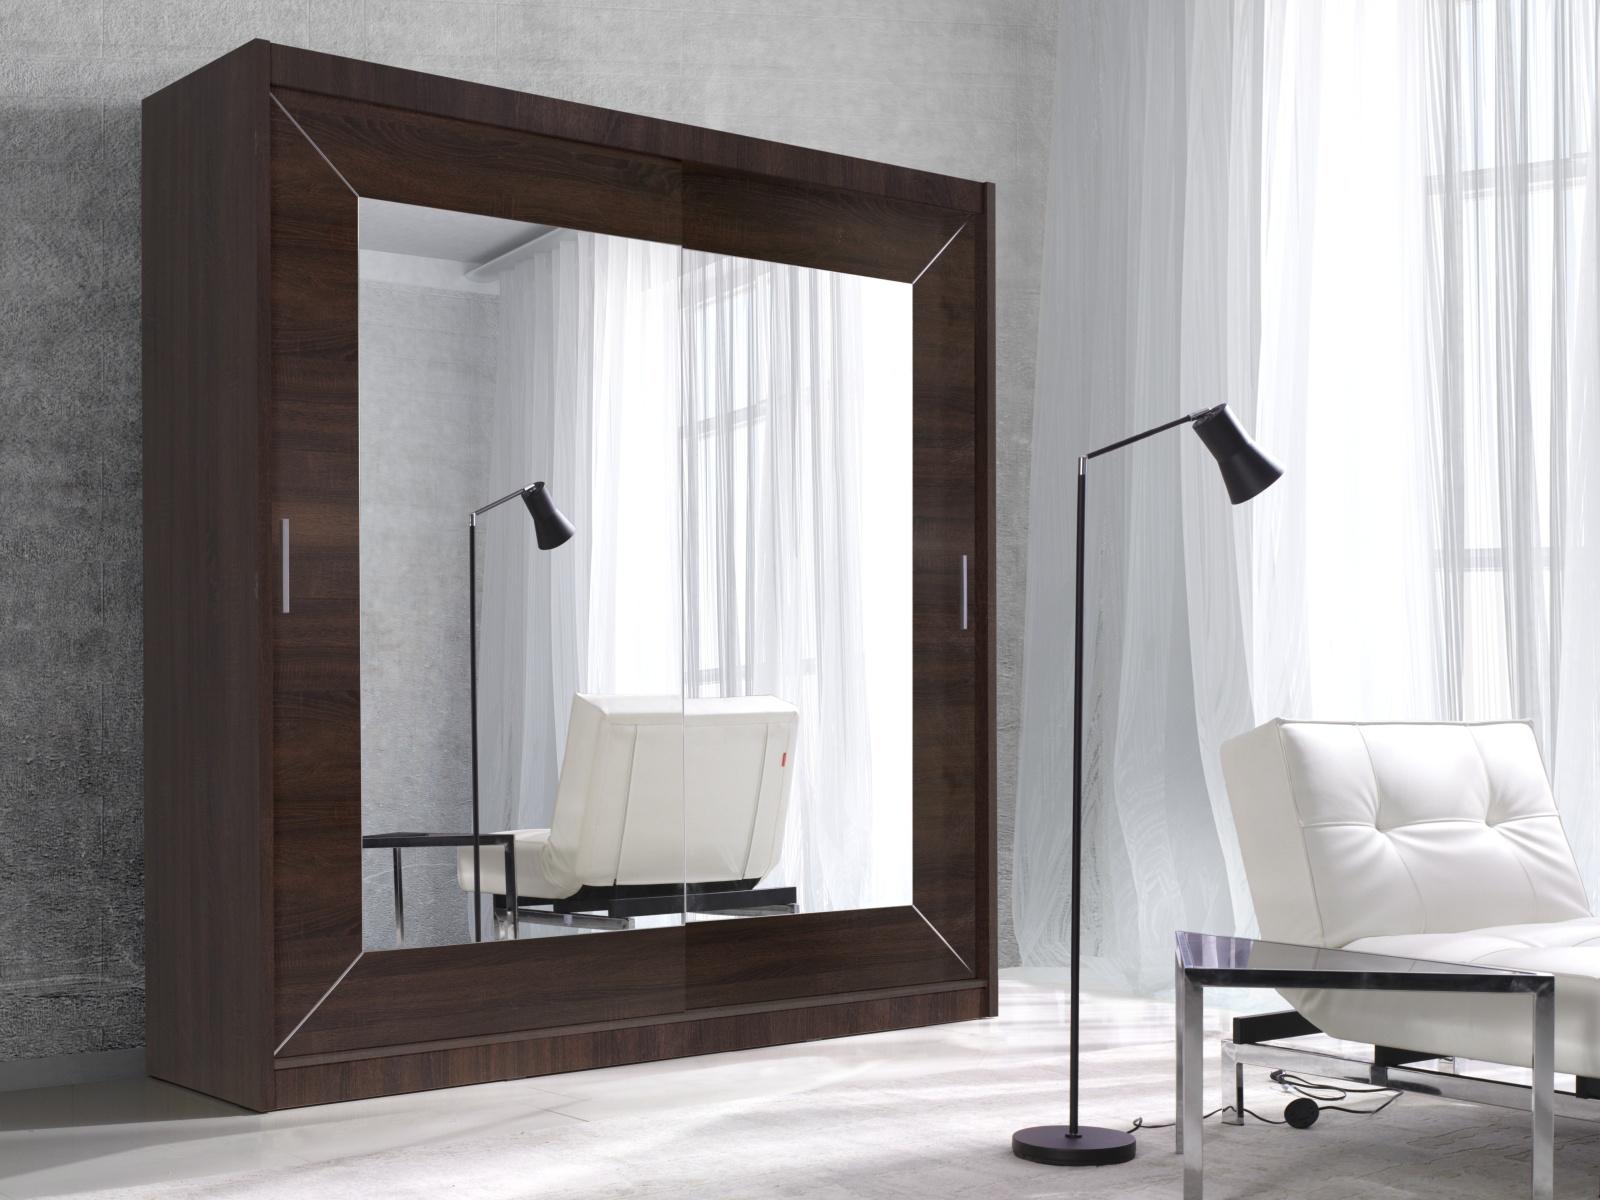 Smartshop ALFA šatní skříň se zrcadlem 200 TYP 18, dub sonoma tmavý